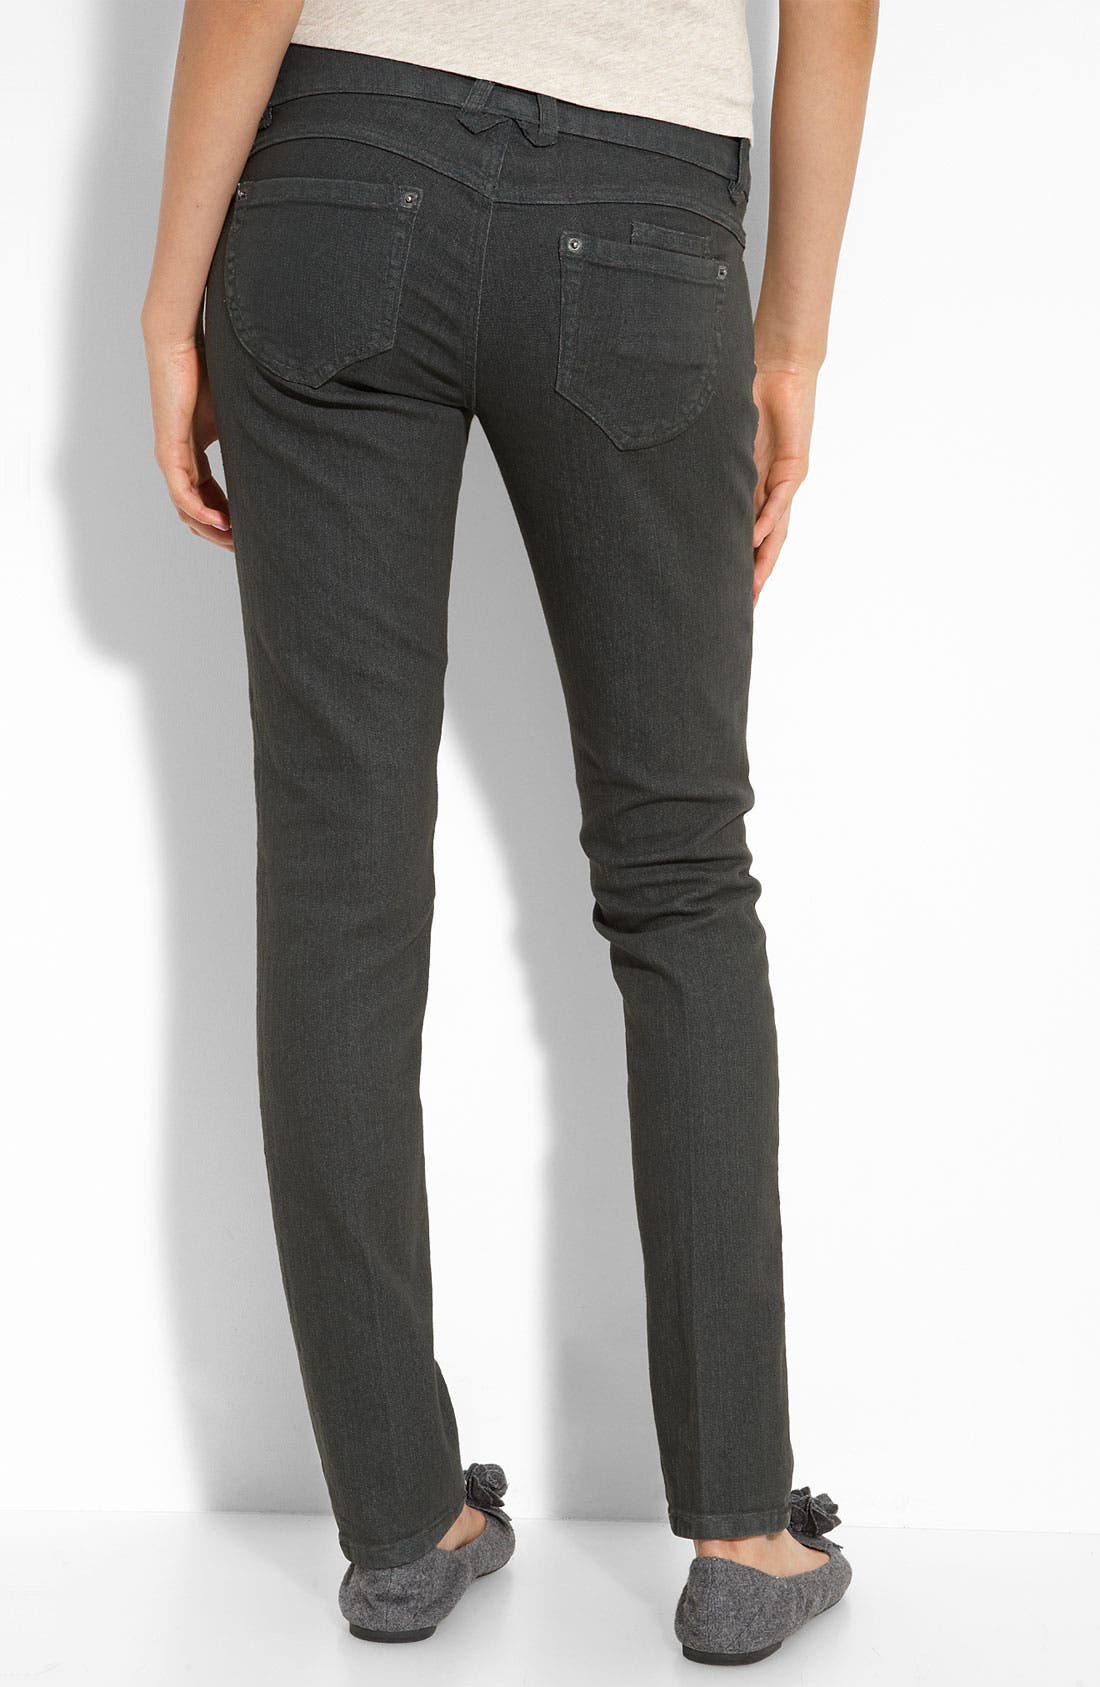 Alternate Image 1 Selected - Jolt Skinny Jeans (Indigo Wash) (Juniors)